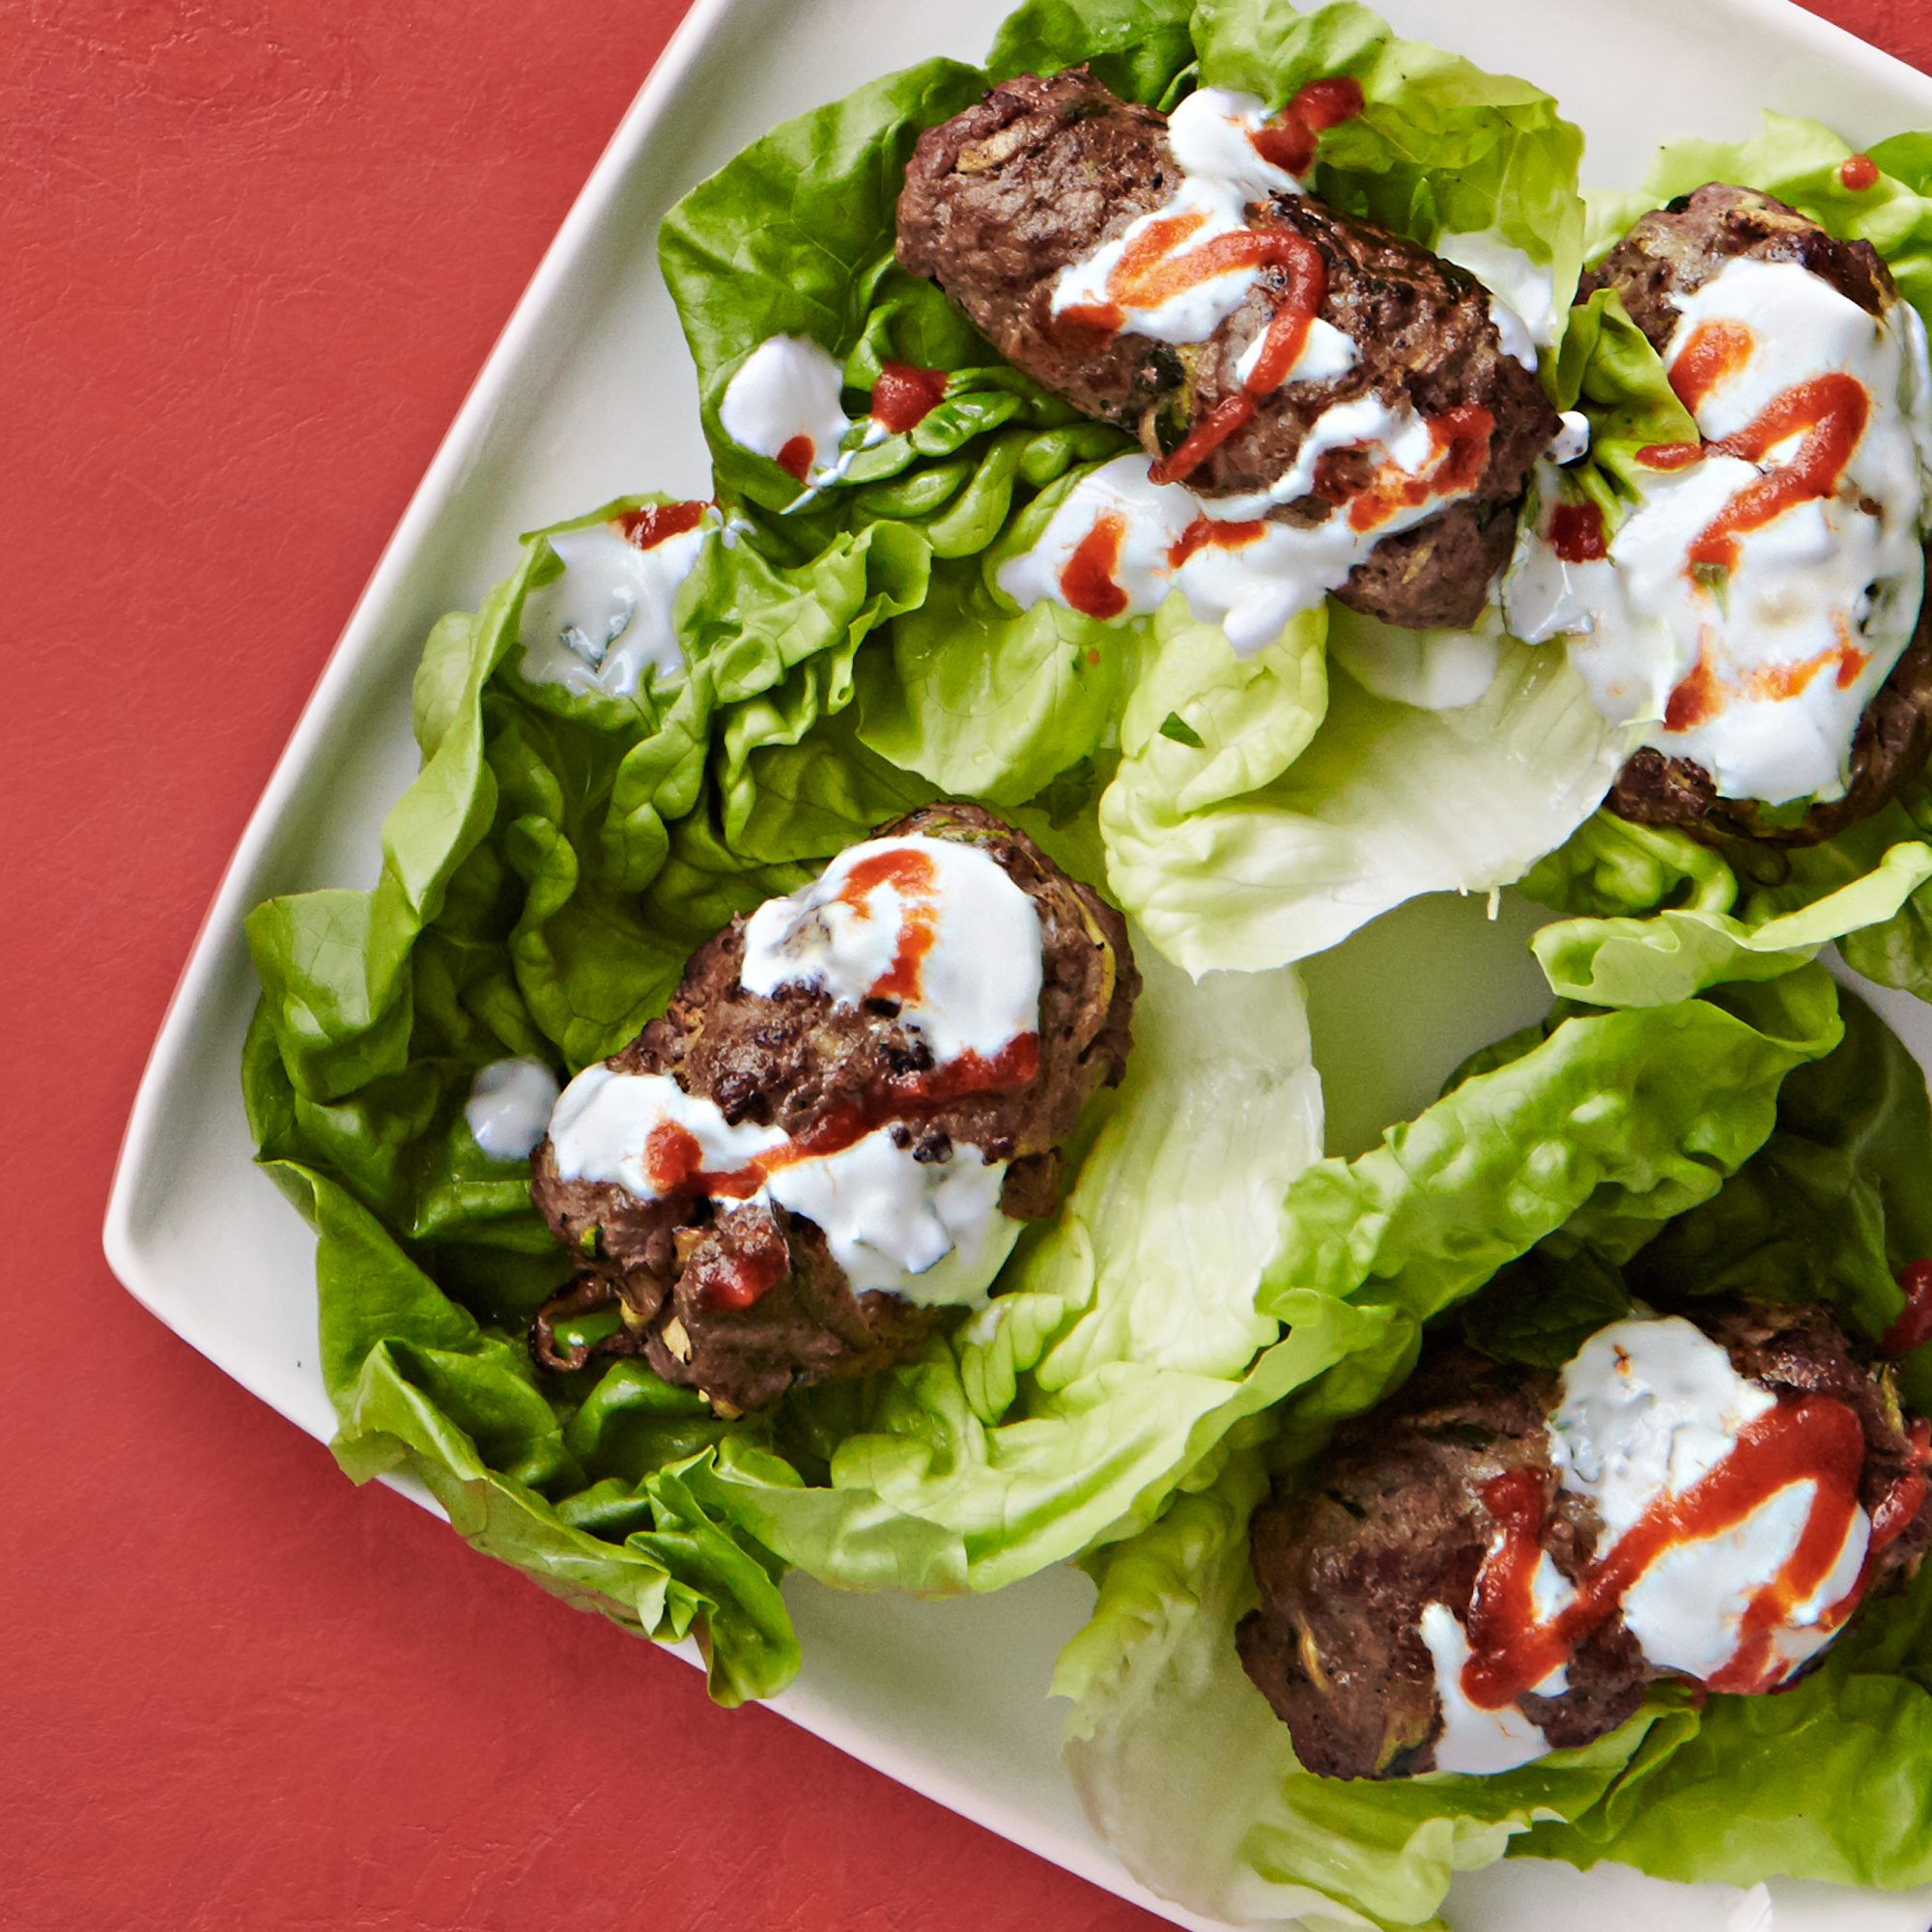 Beef & Zucchini Lettuce Wraps